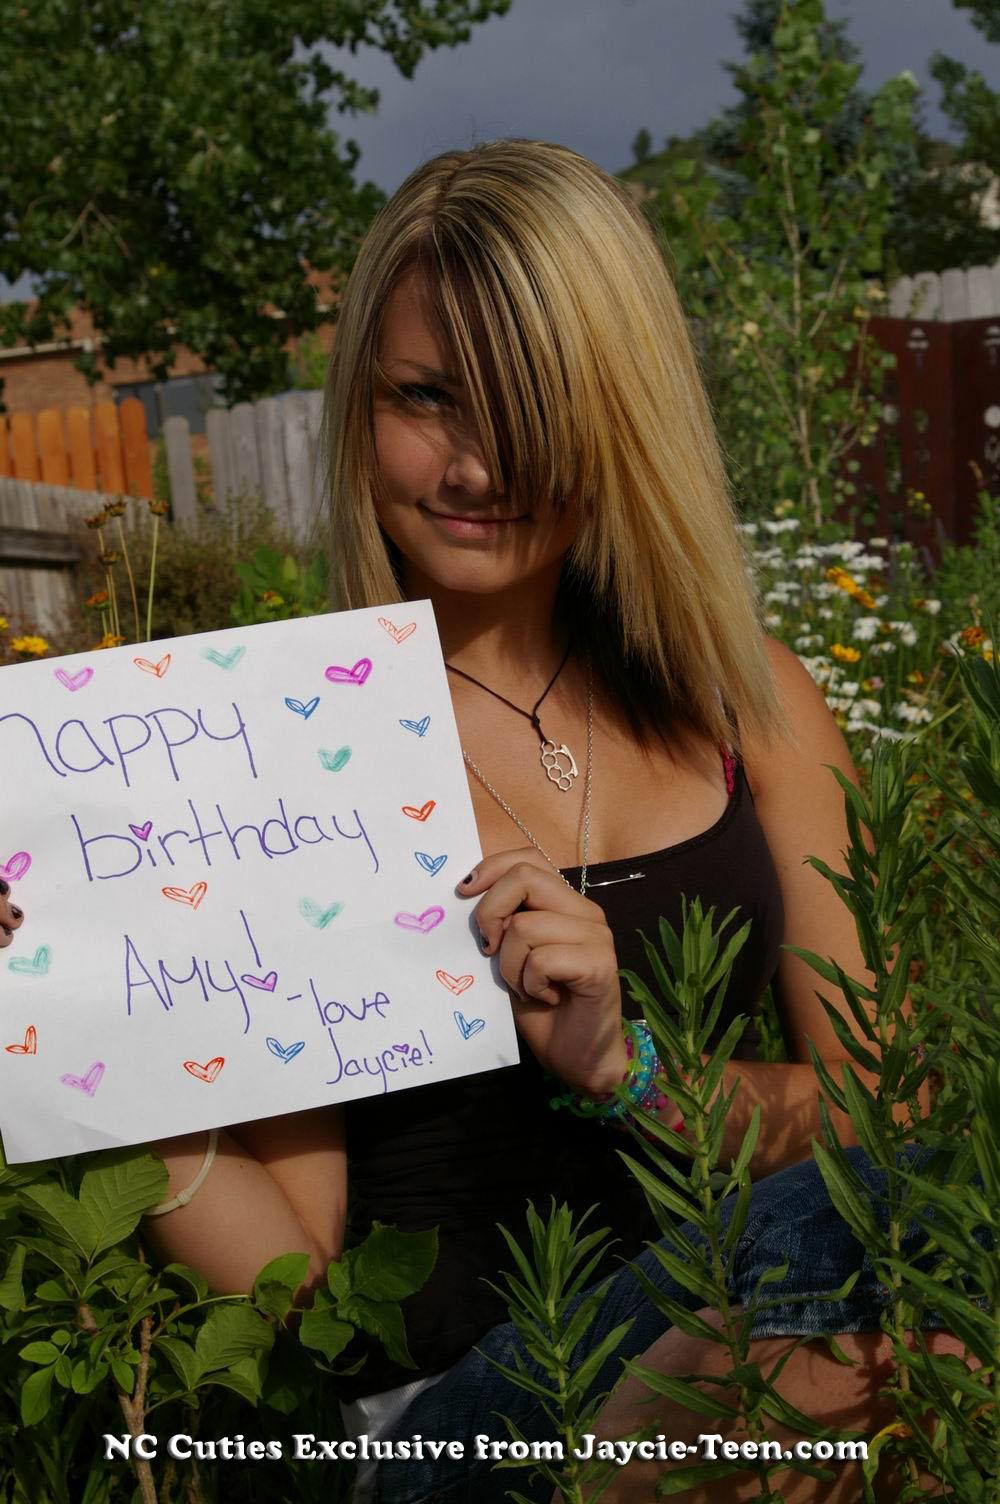 NC Cuties - My Birthday Gift From Jaycie!